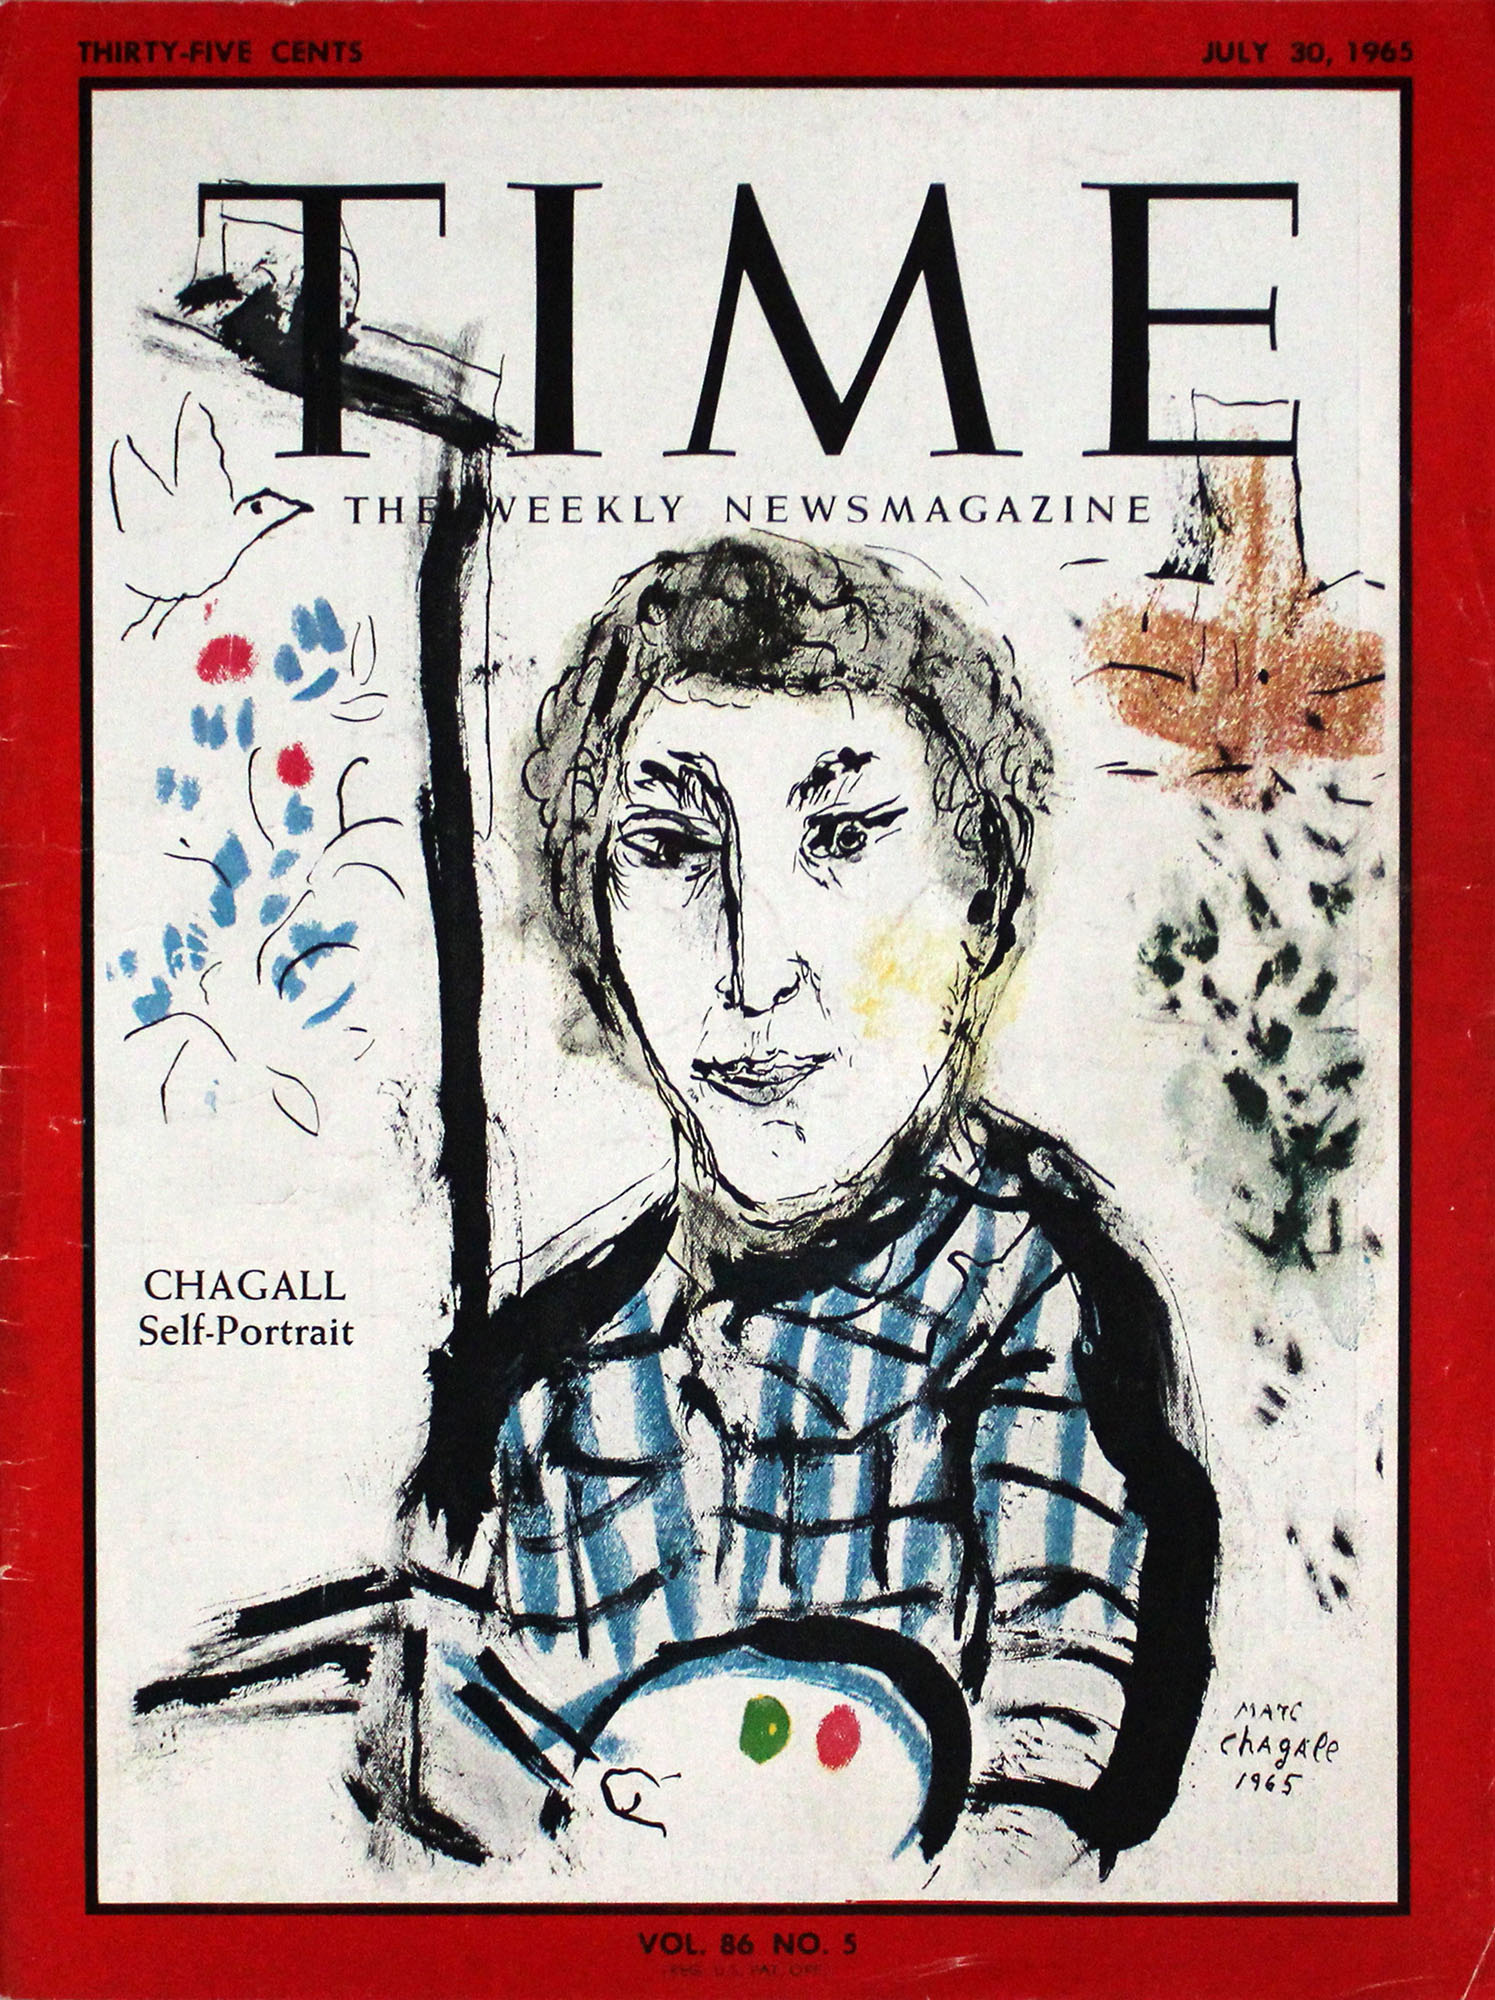 Time Vol. 86 No. 5